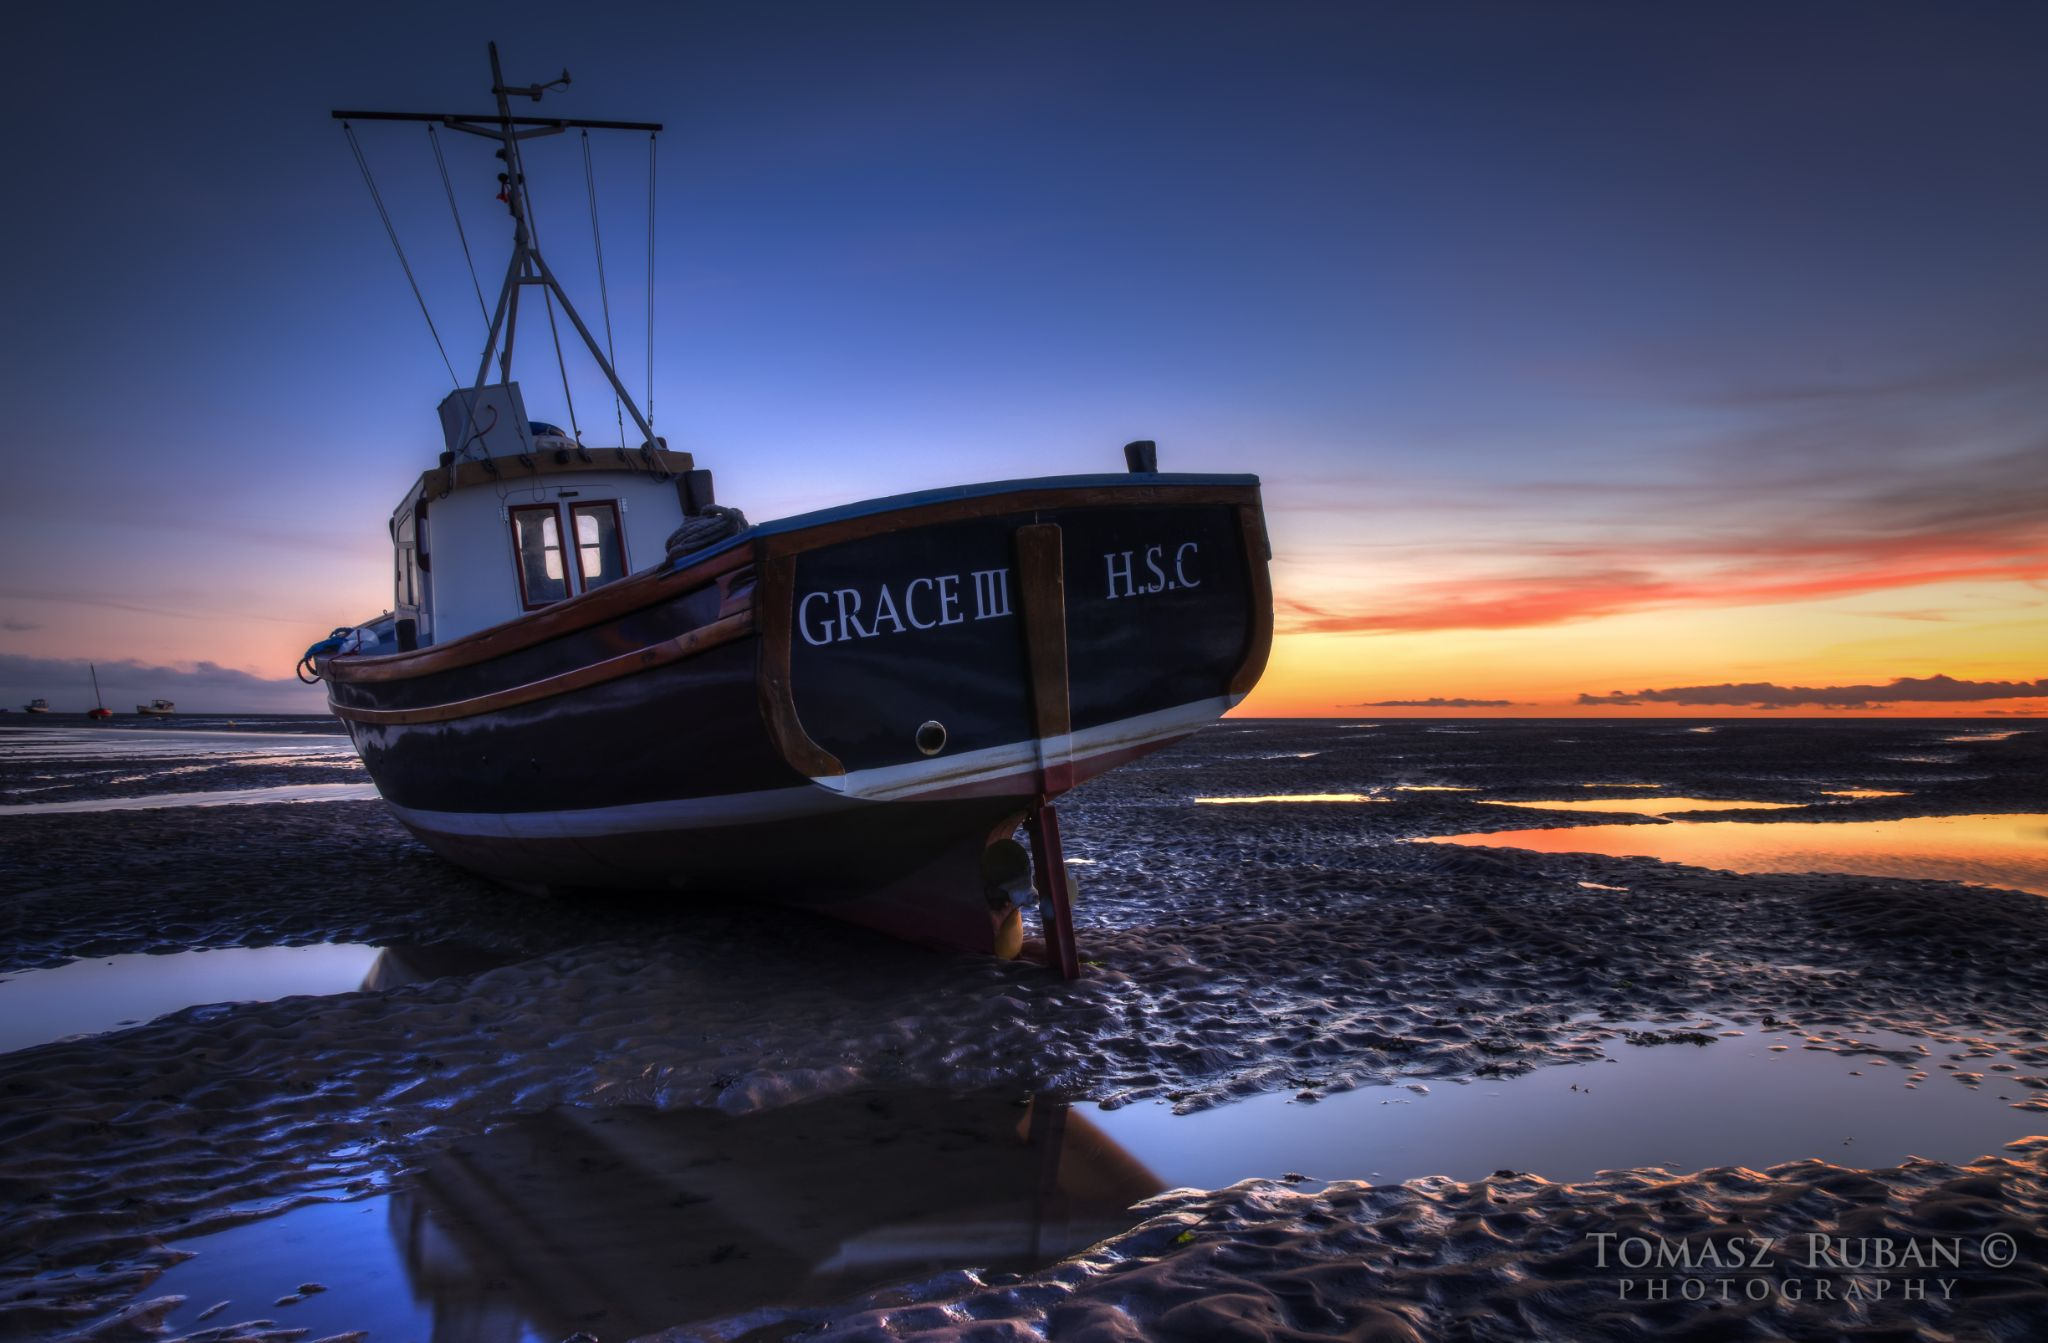 Grace 3 H.S.C by Tomasz Ruban Photography